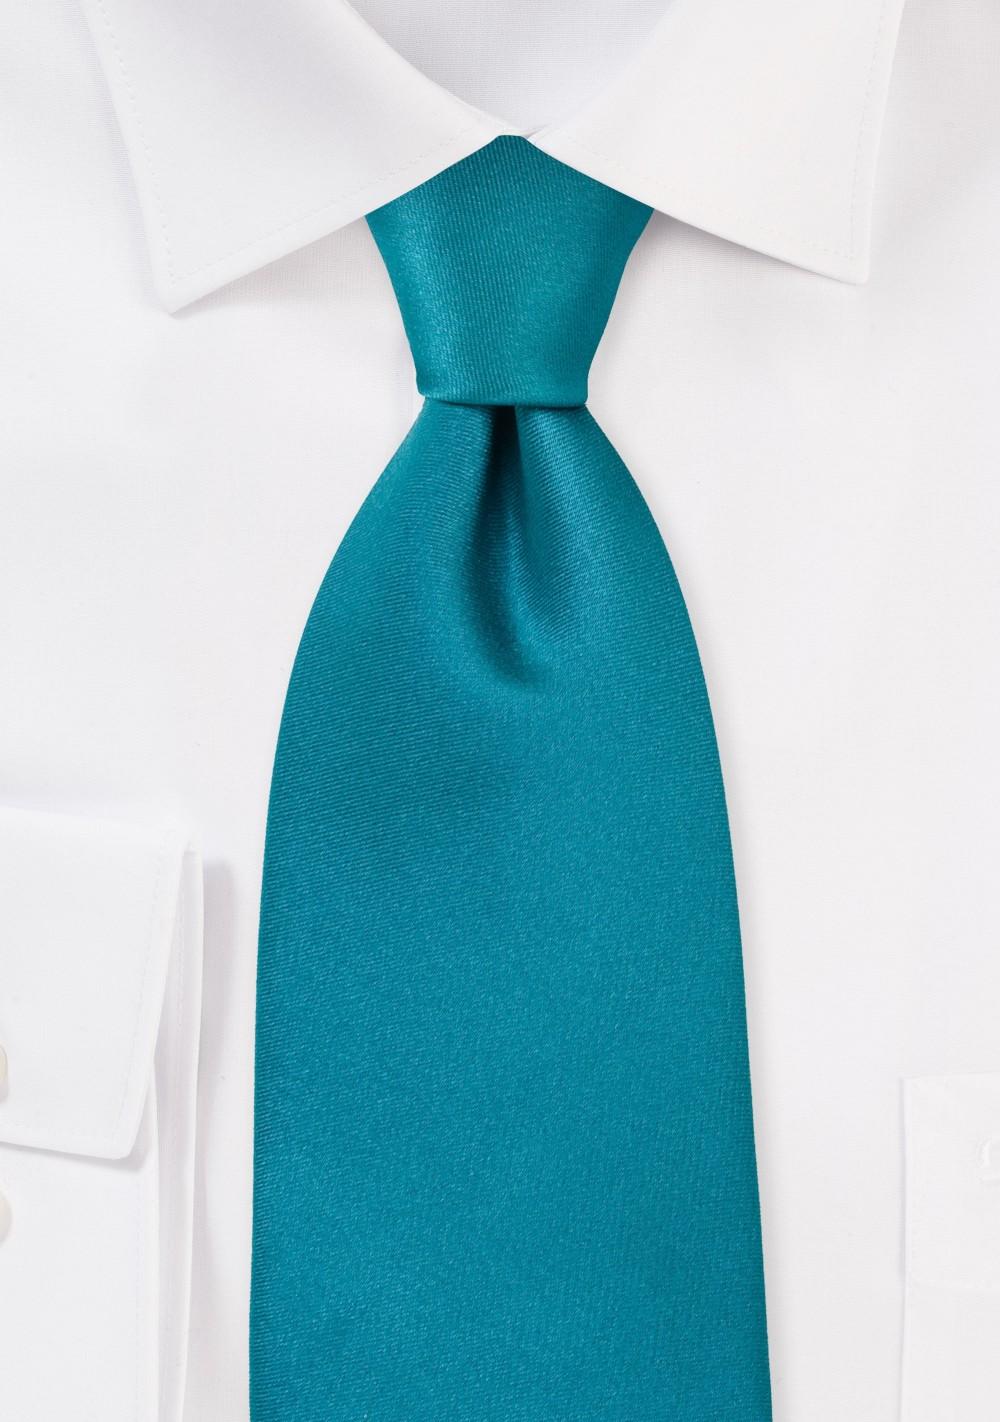 Solid XL Tie in Jade Green